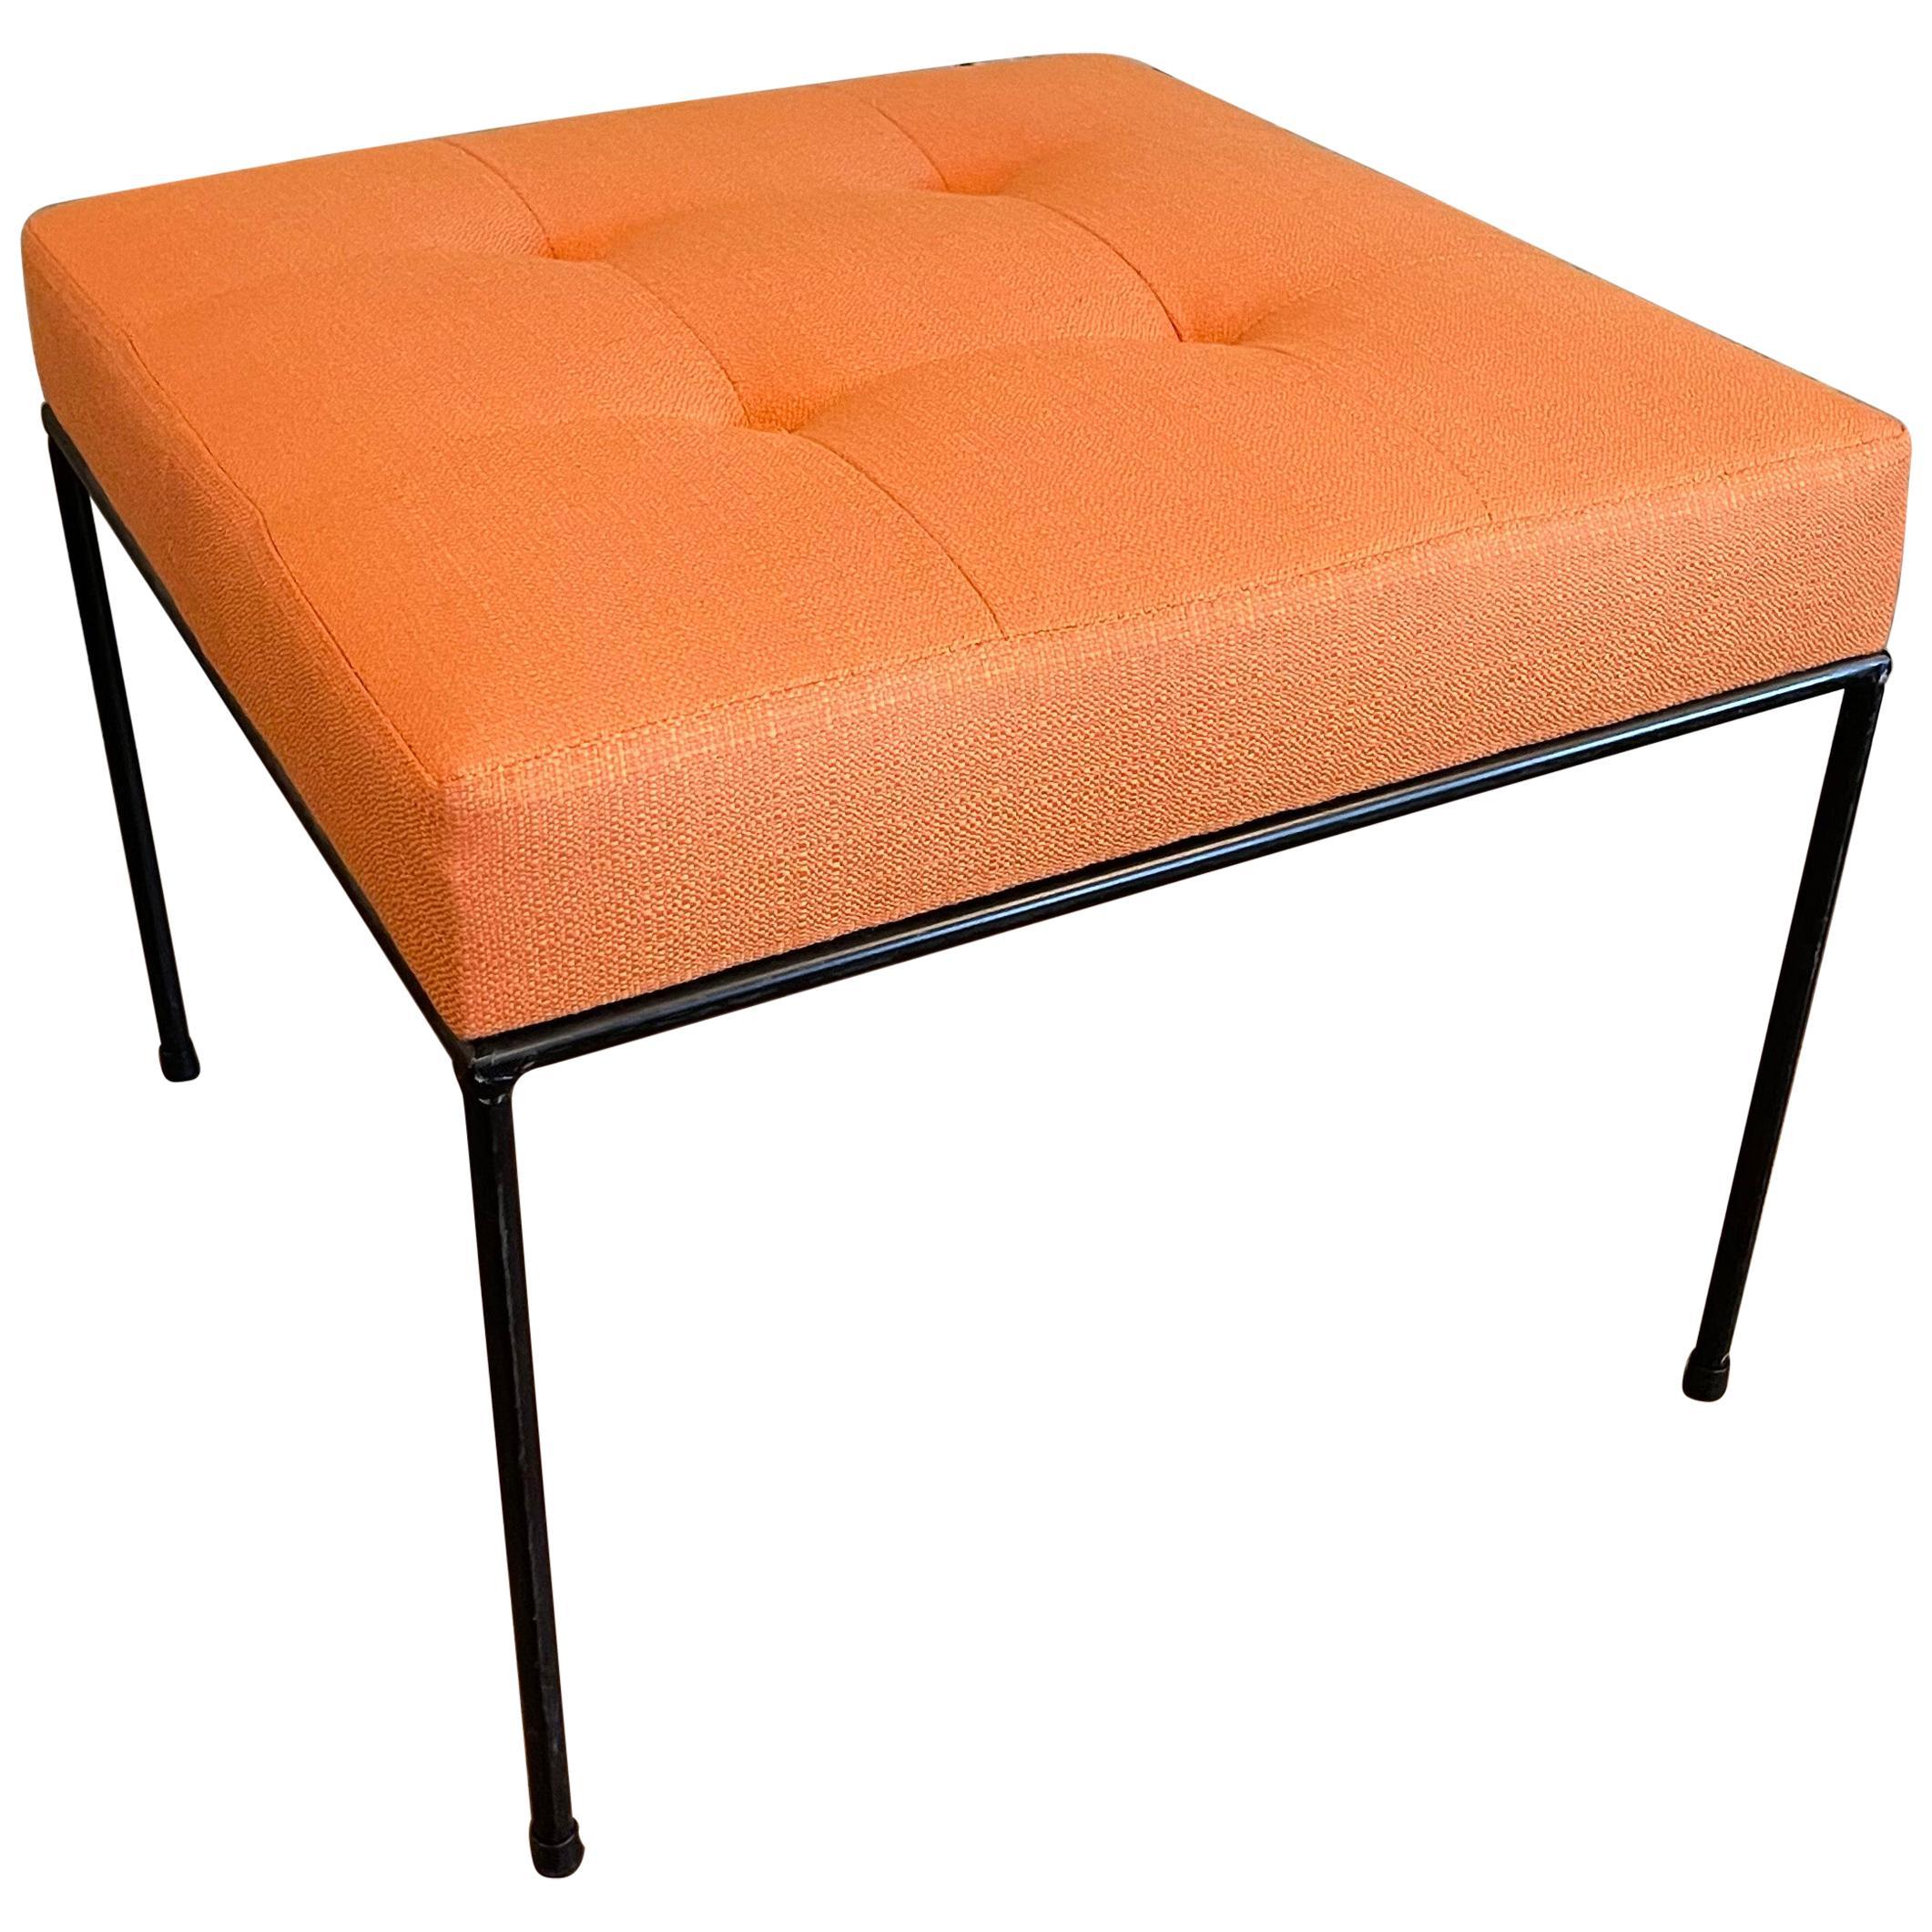 cFsignature Minimal Upholstered Wrought Iron Ottoman